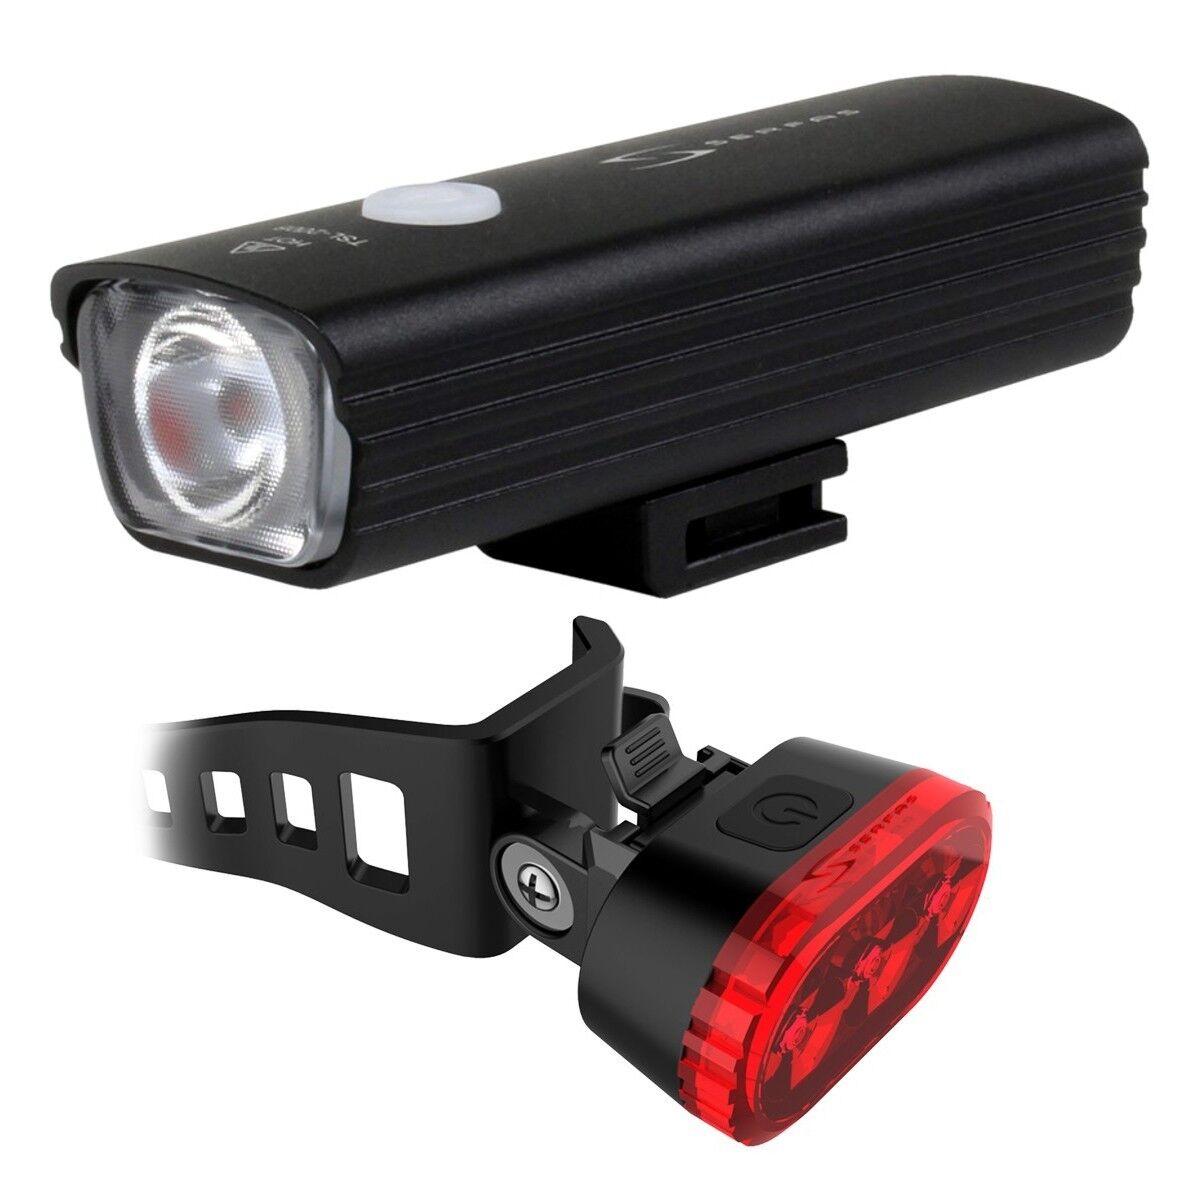 Serfas E-Lume Bike  Headlight Taillight Combo UTL-15 USL-200 USB Rechargeable  high quality & fast shipping